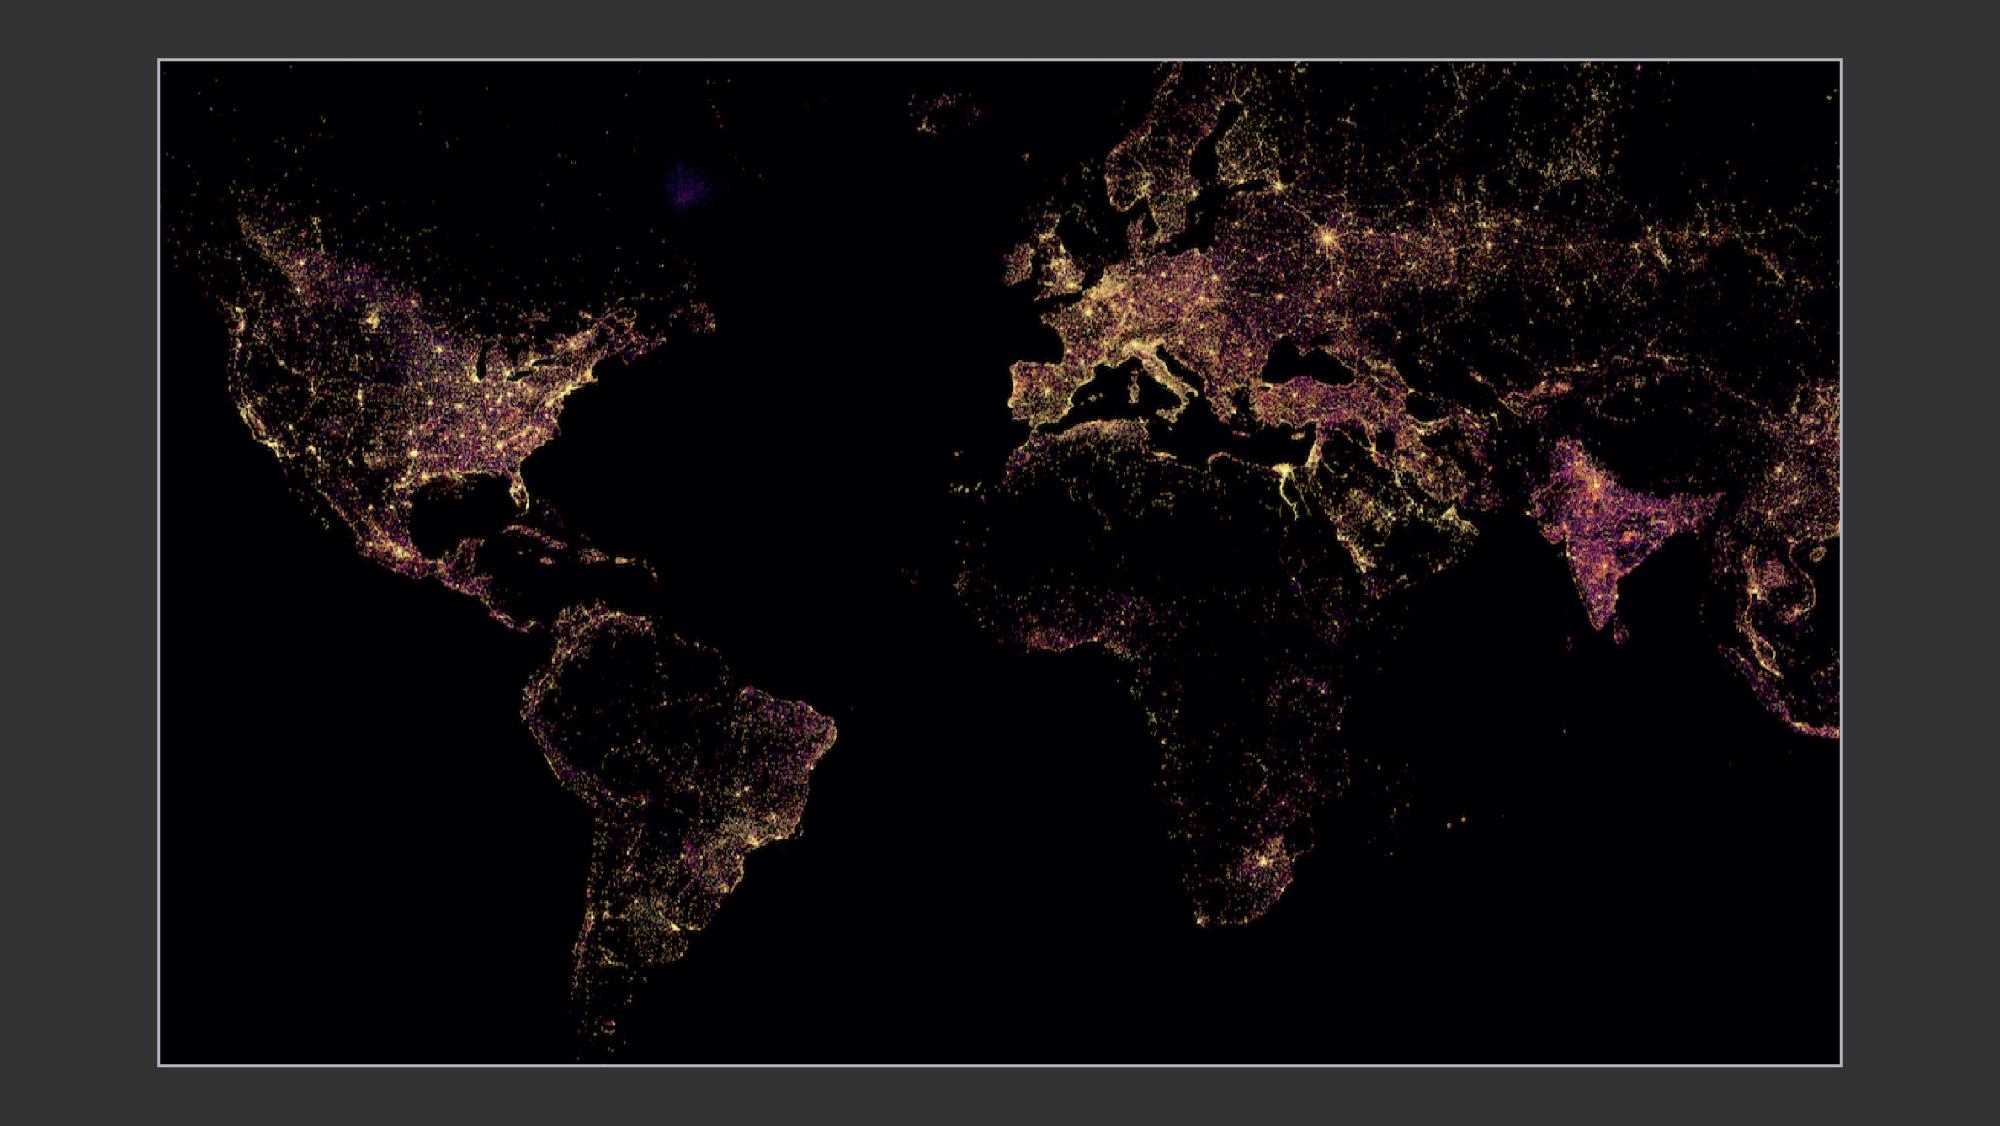 Sample results showing global settlement-level electrification